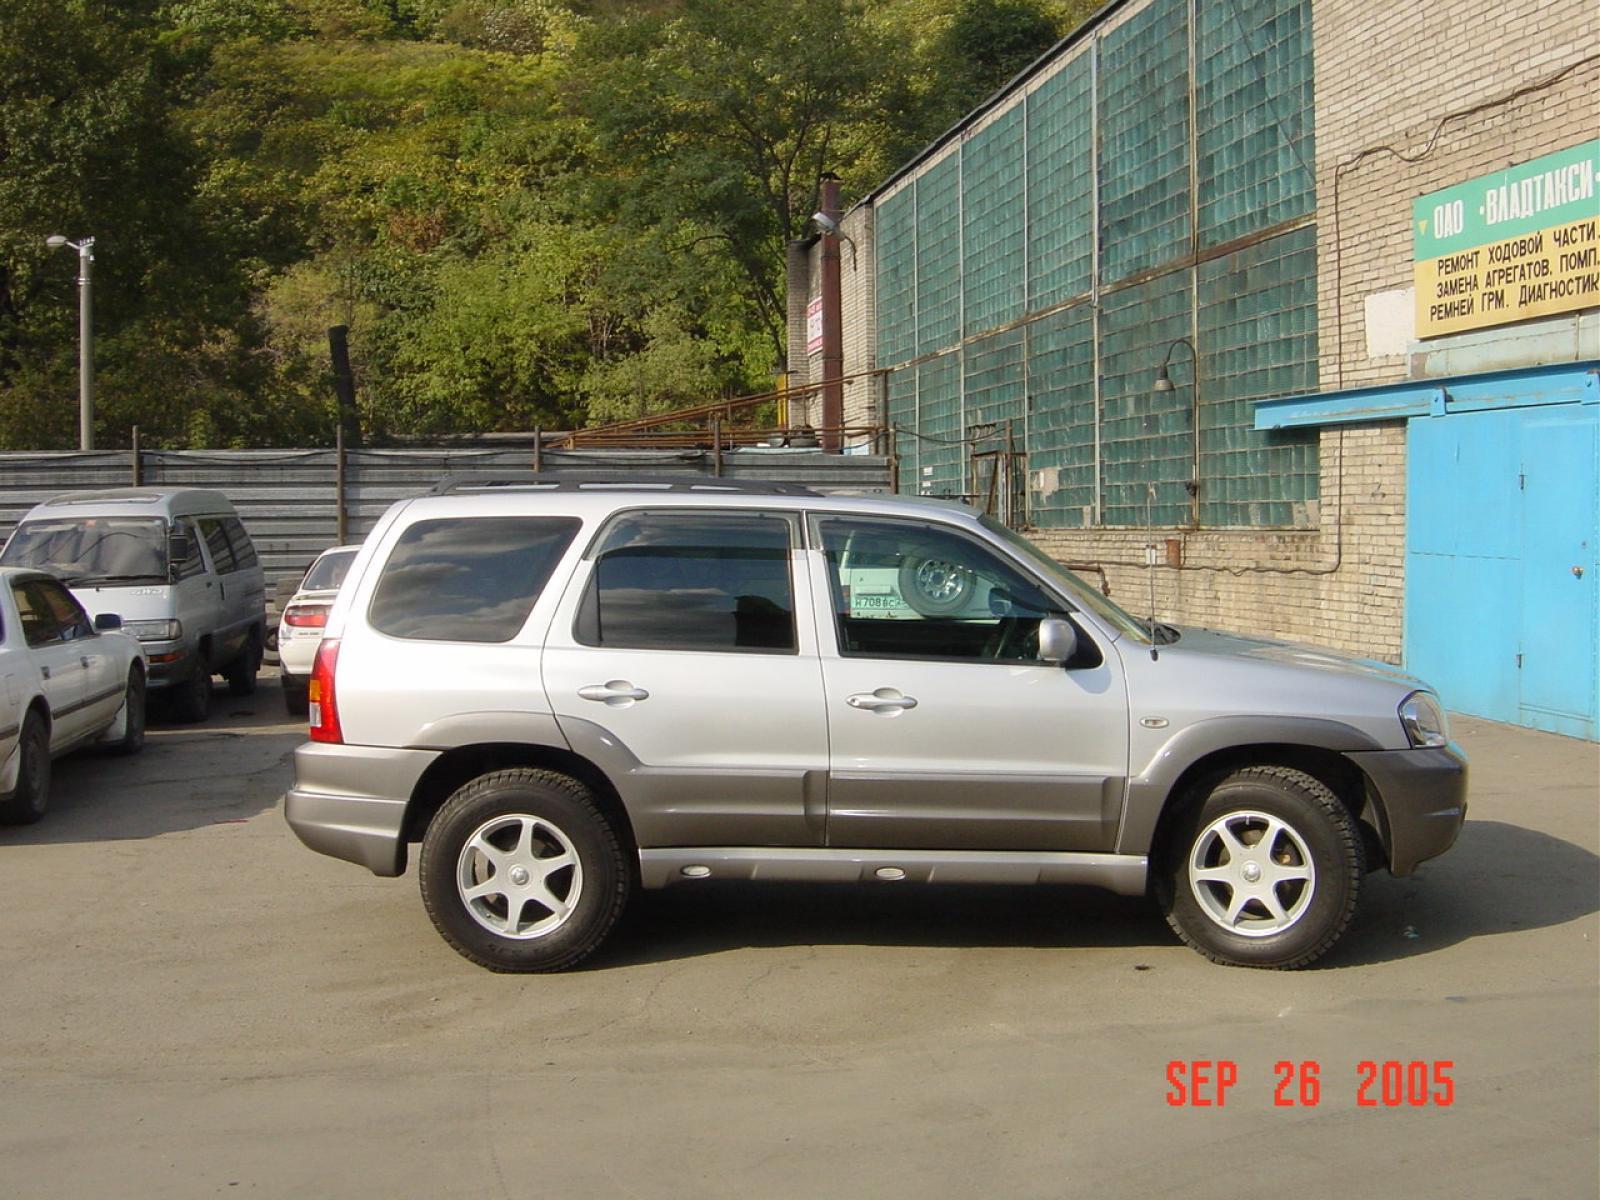 Kelebihan Kekurangan Mazda 2002 Murah Berkualitas